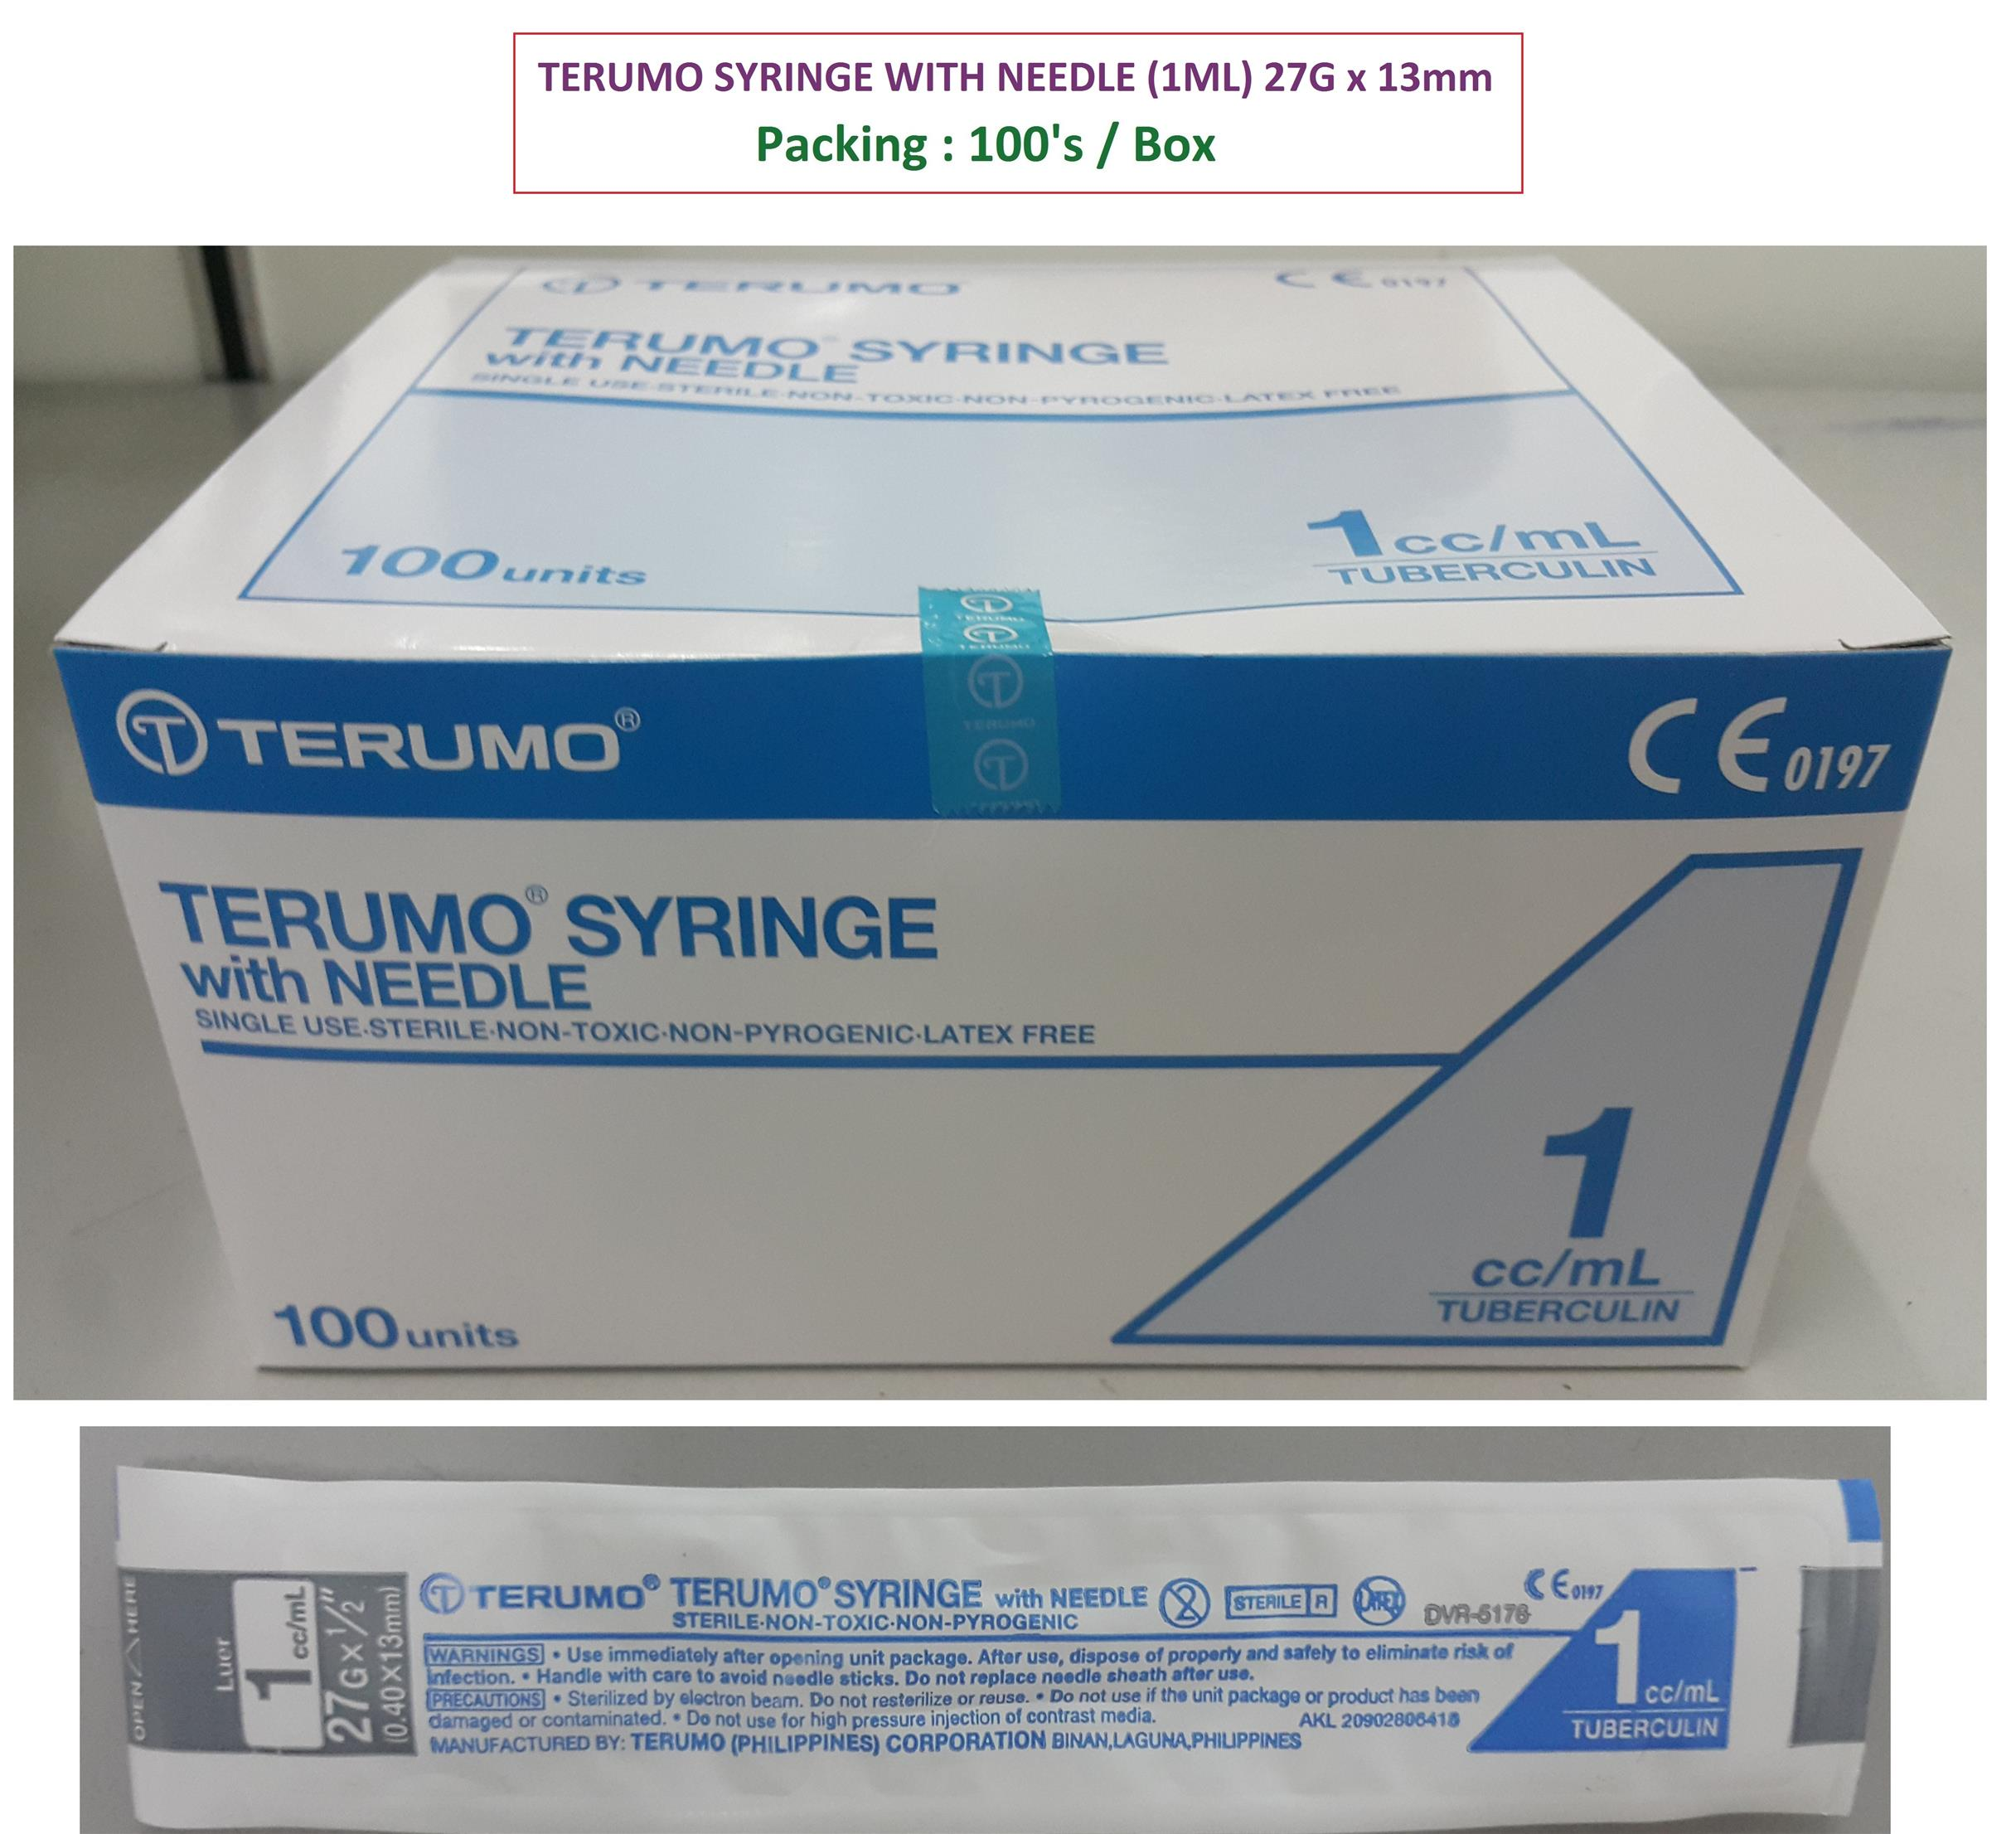 TERUMO SYRINGE 1ML WITH DETACHABLE NEEDLE ( 27G x 13mm ) : 5 PCS